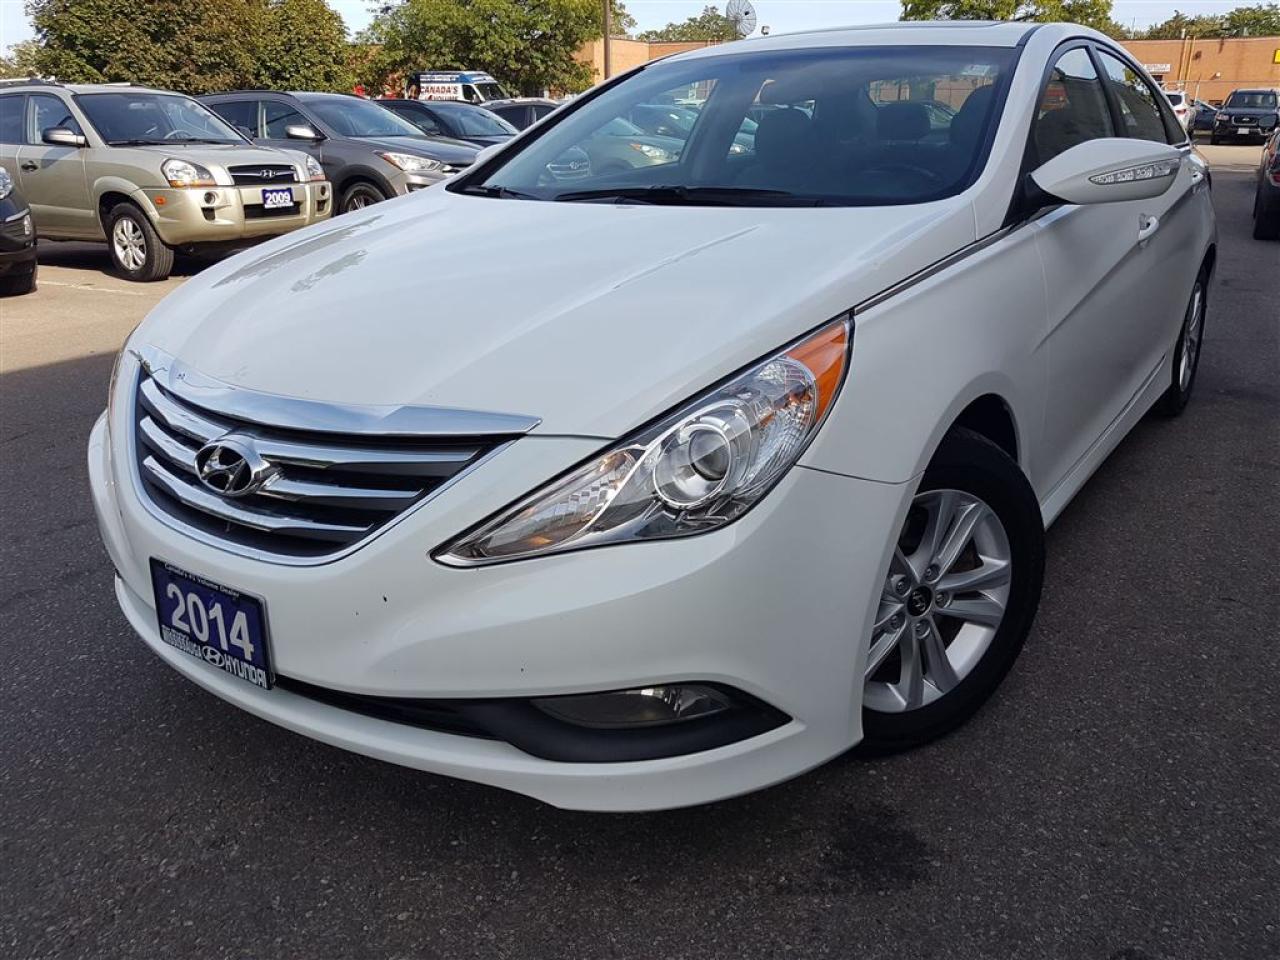 Photo of White 2014 Hyundai Sonata